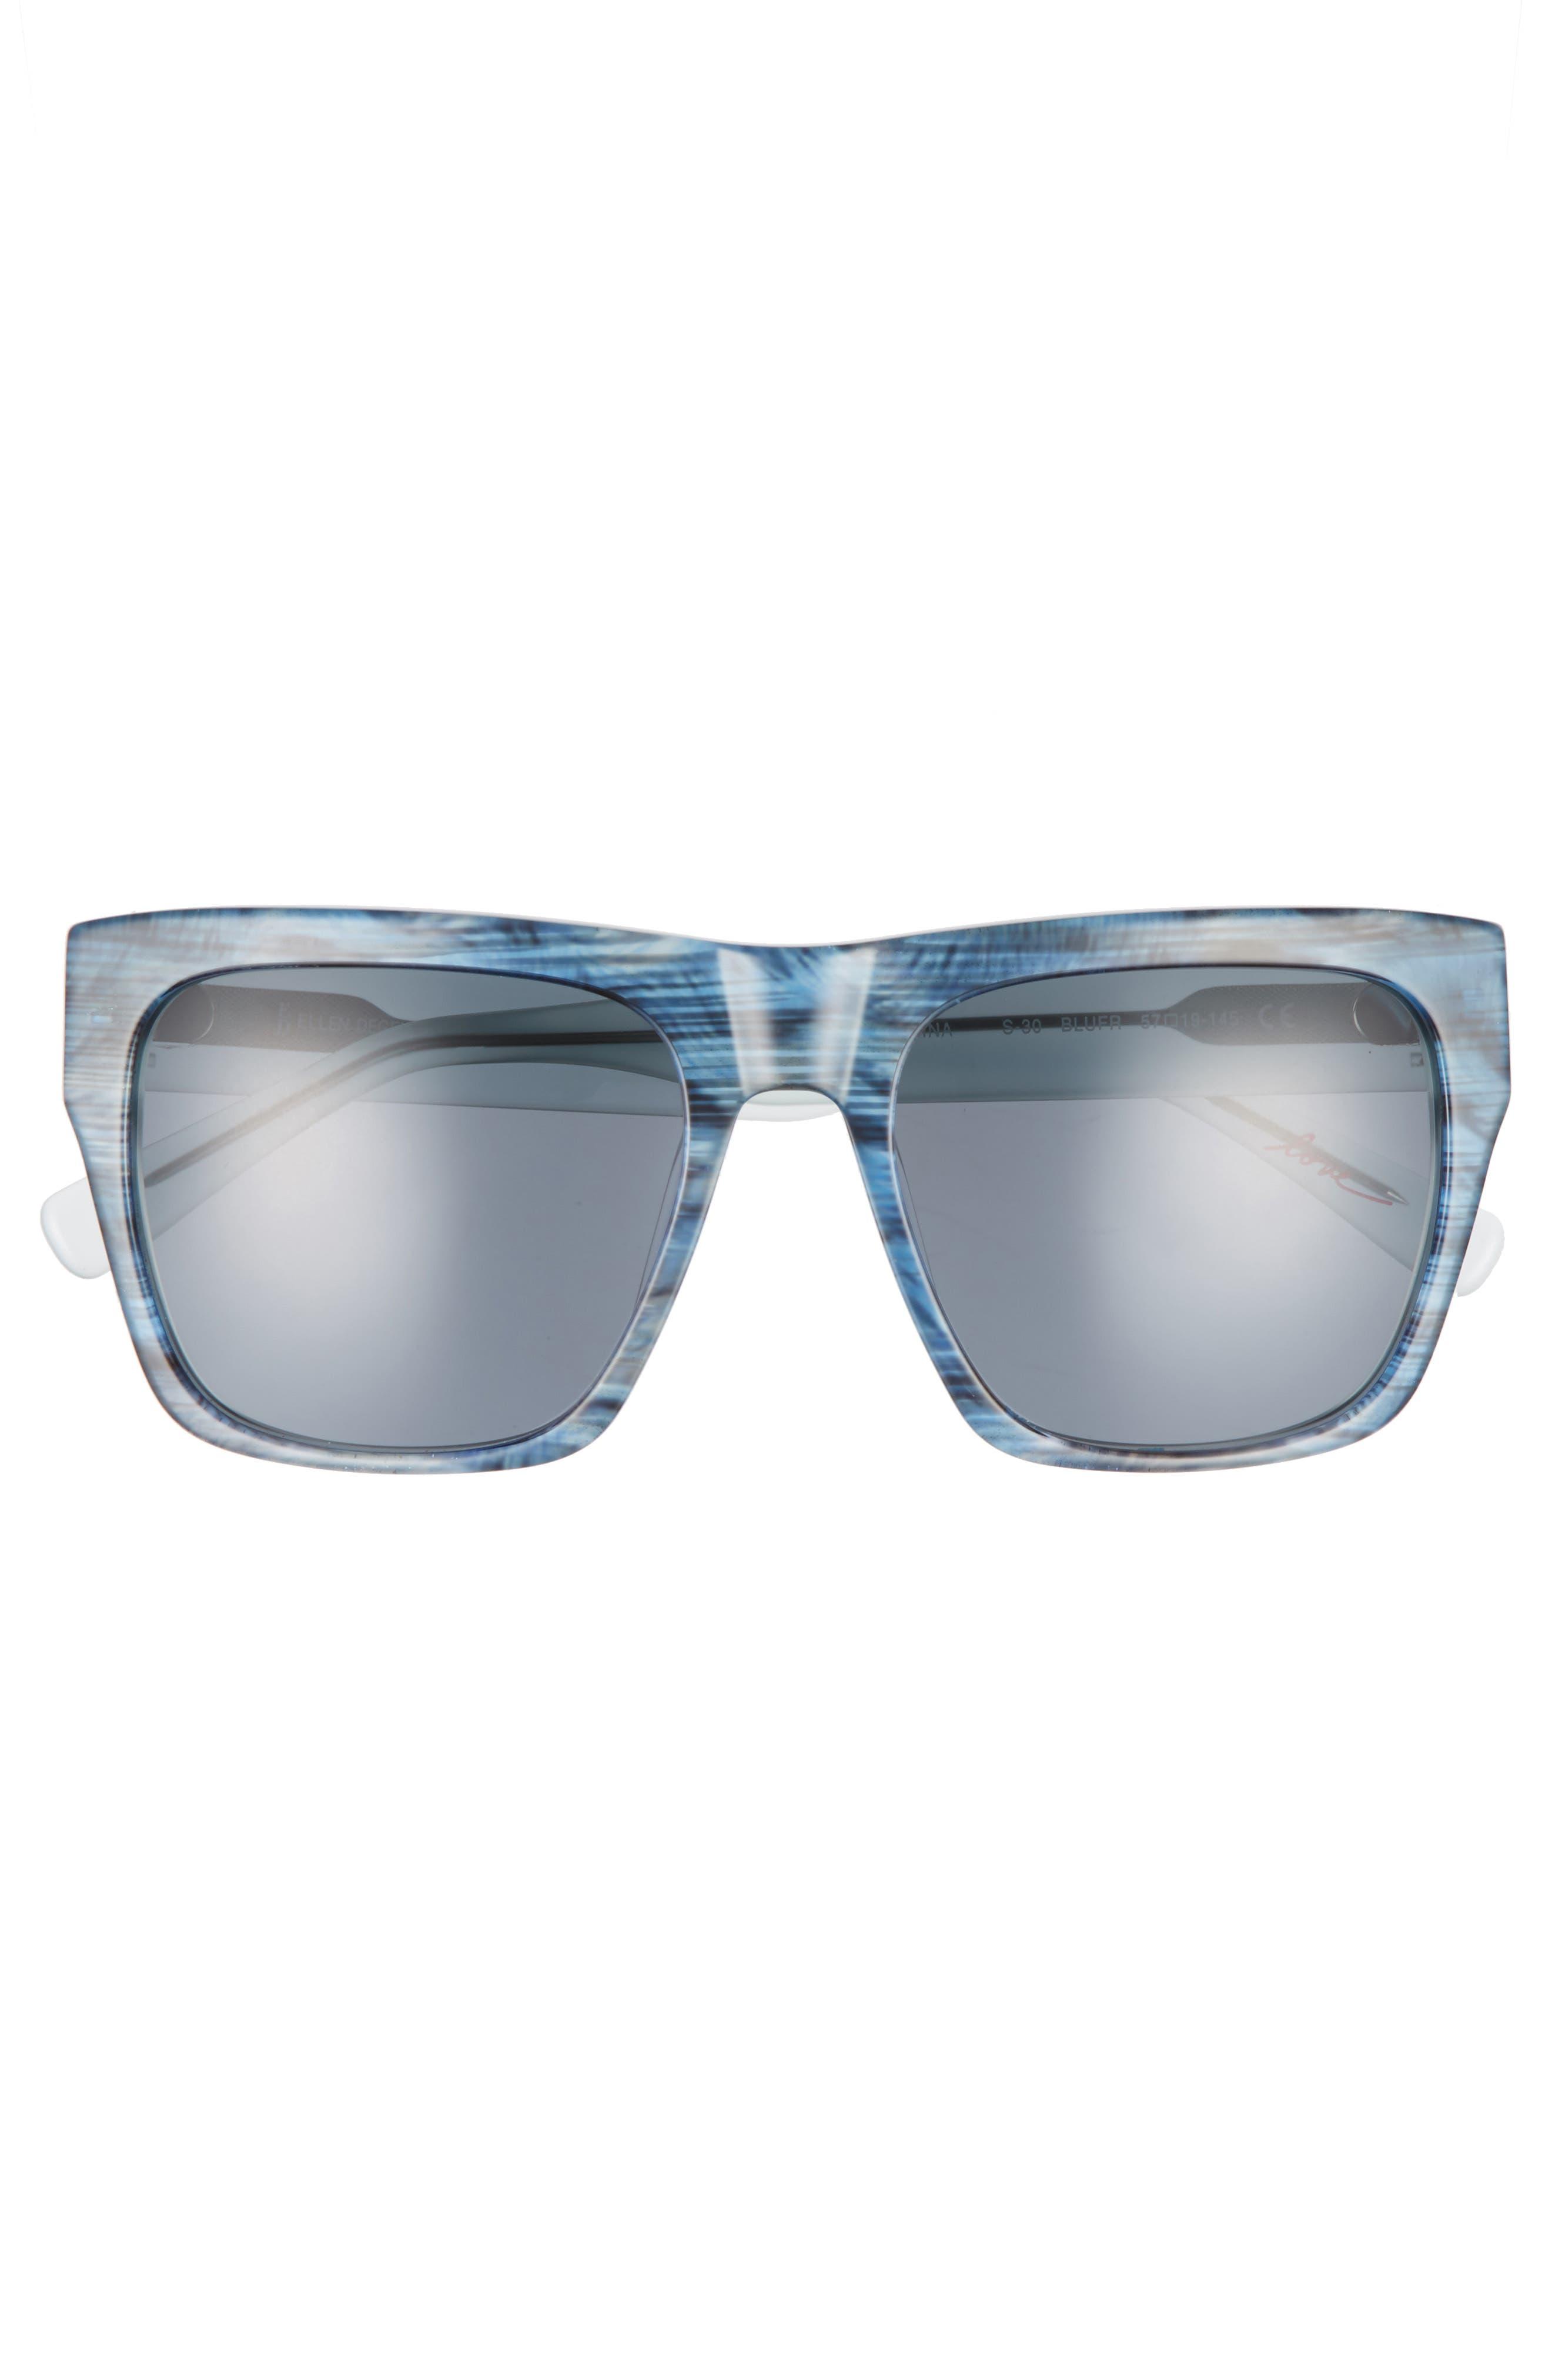 57mm Gradient Square Sunglasses,                             Alternate thumbnail 3, color,                             BLUE FEATHER